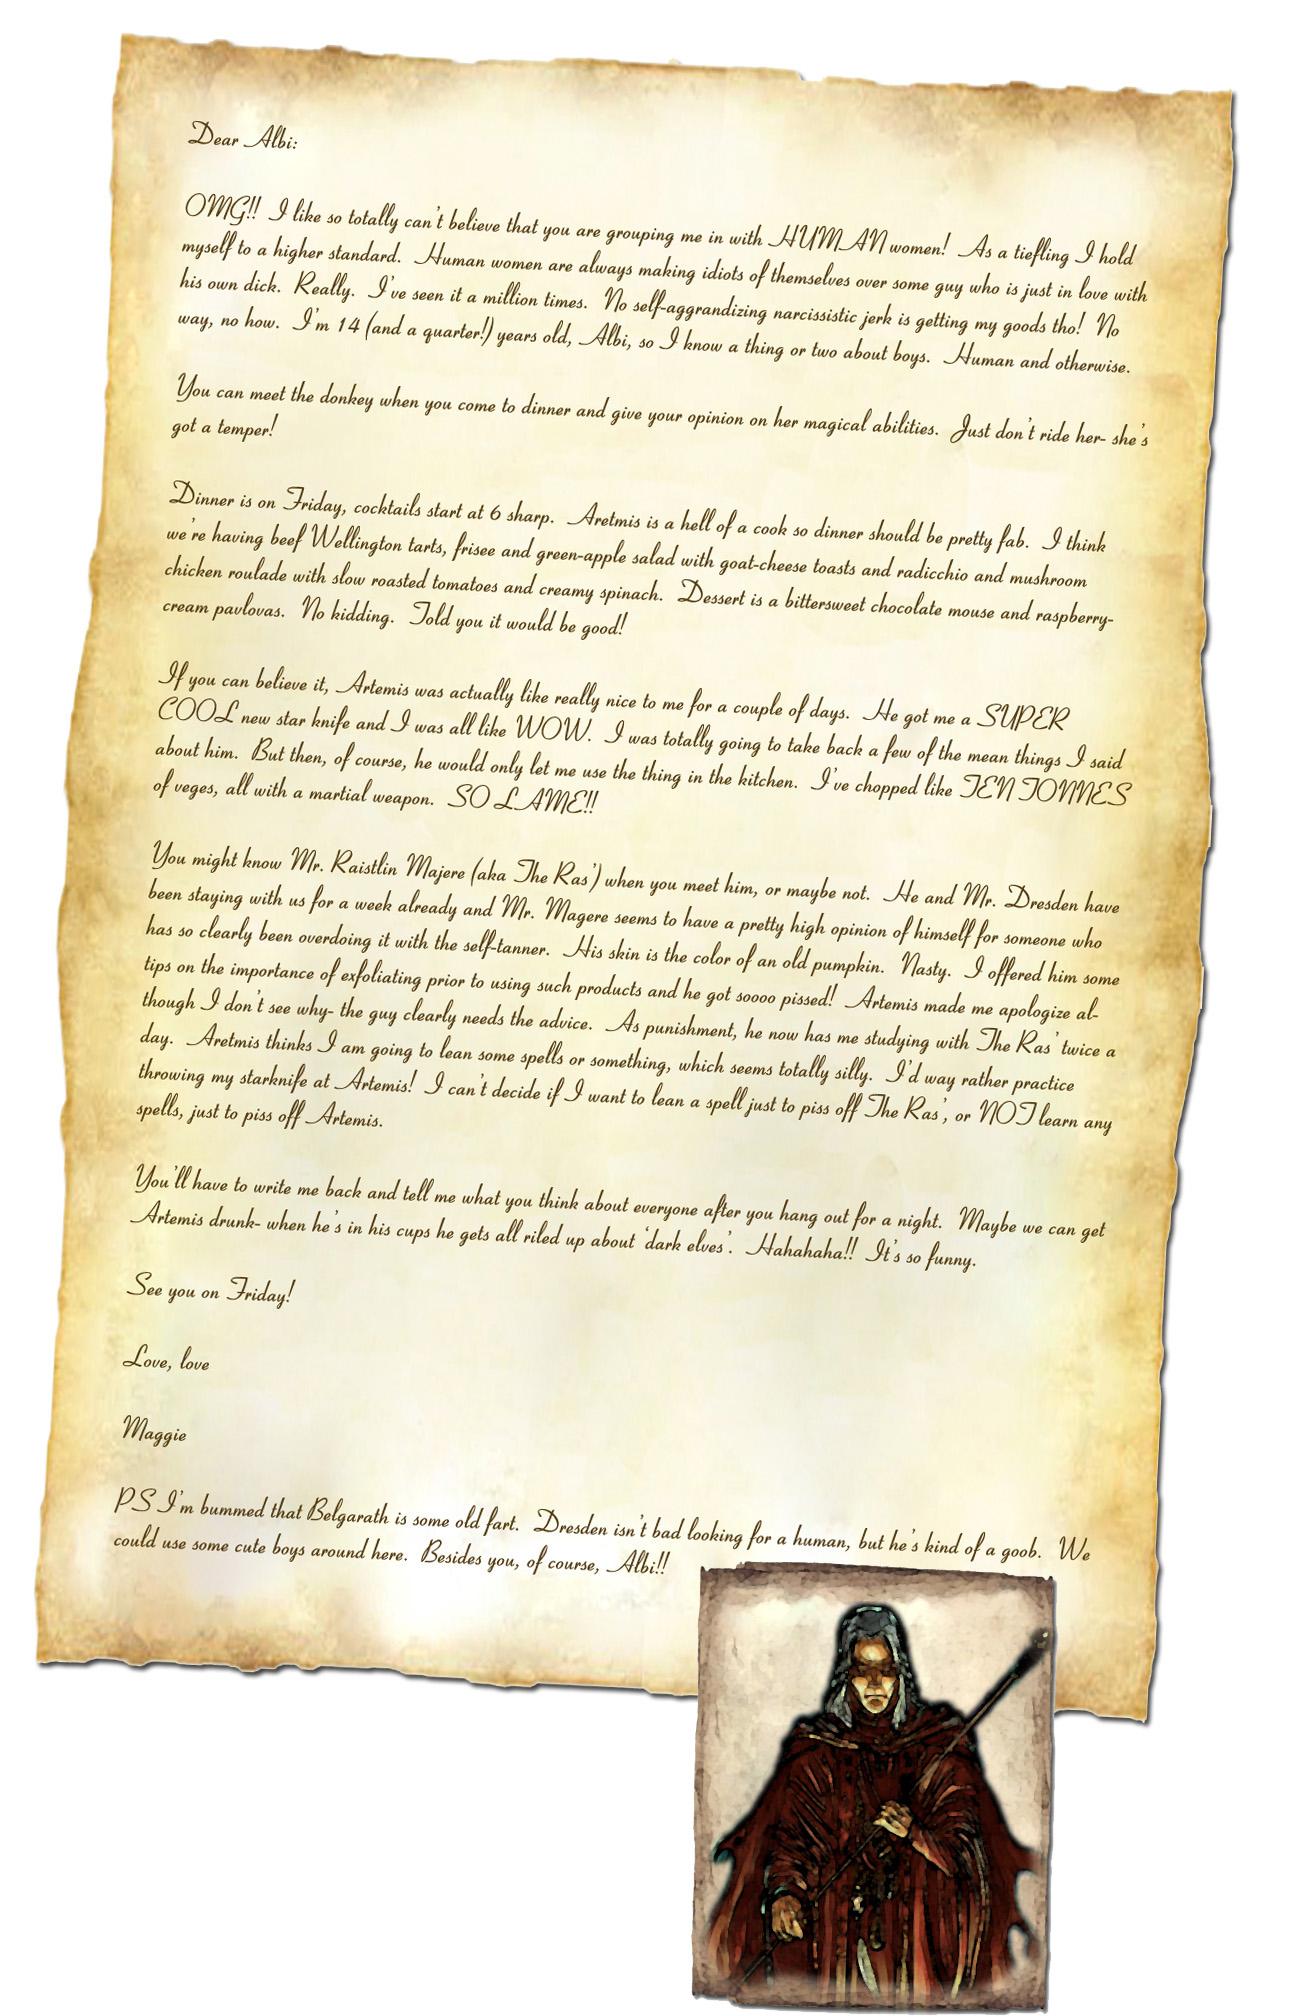 Maggie letter 4 copy